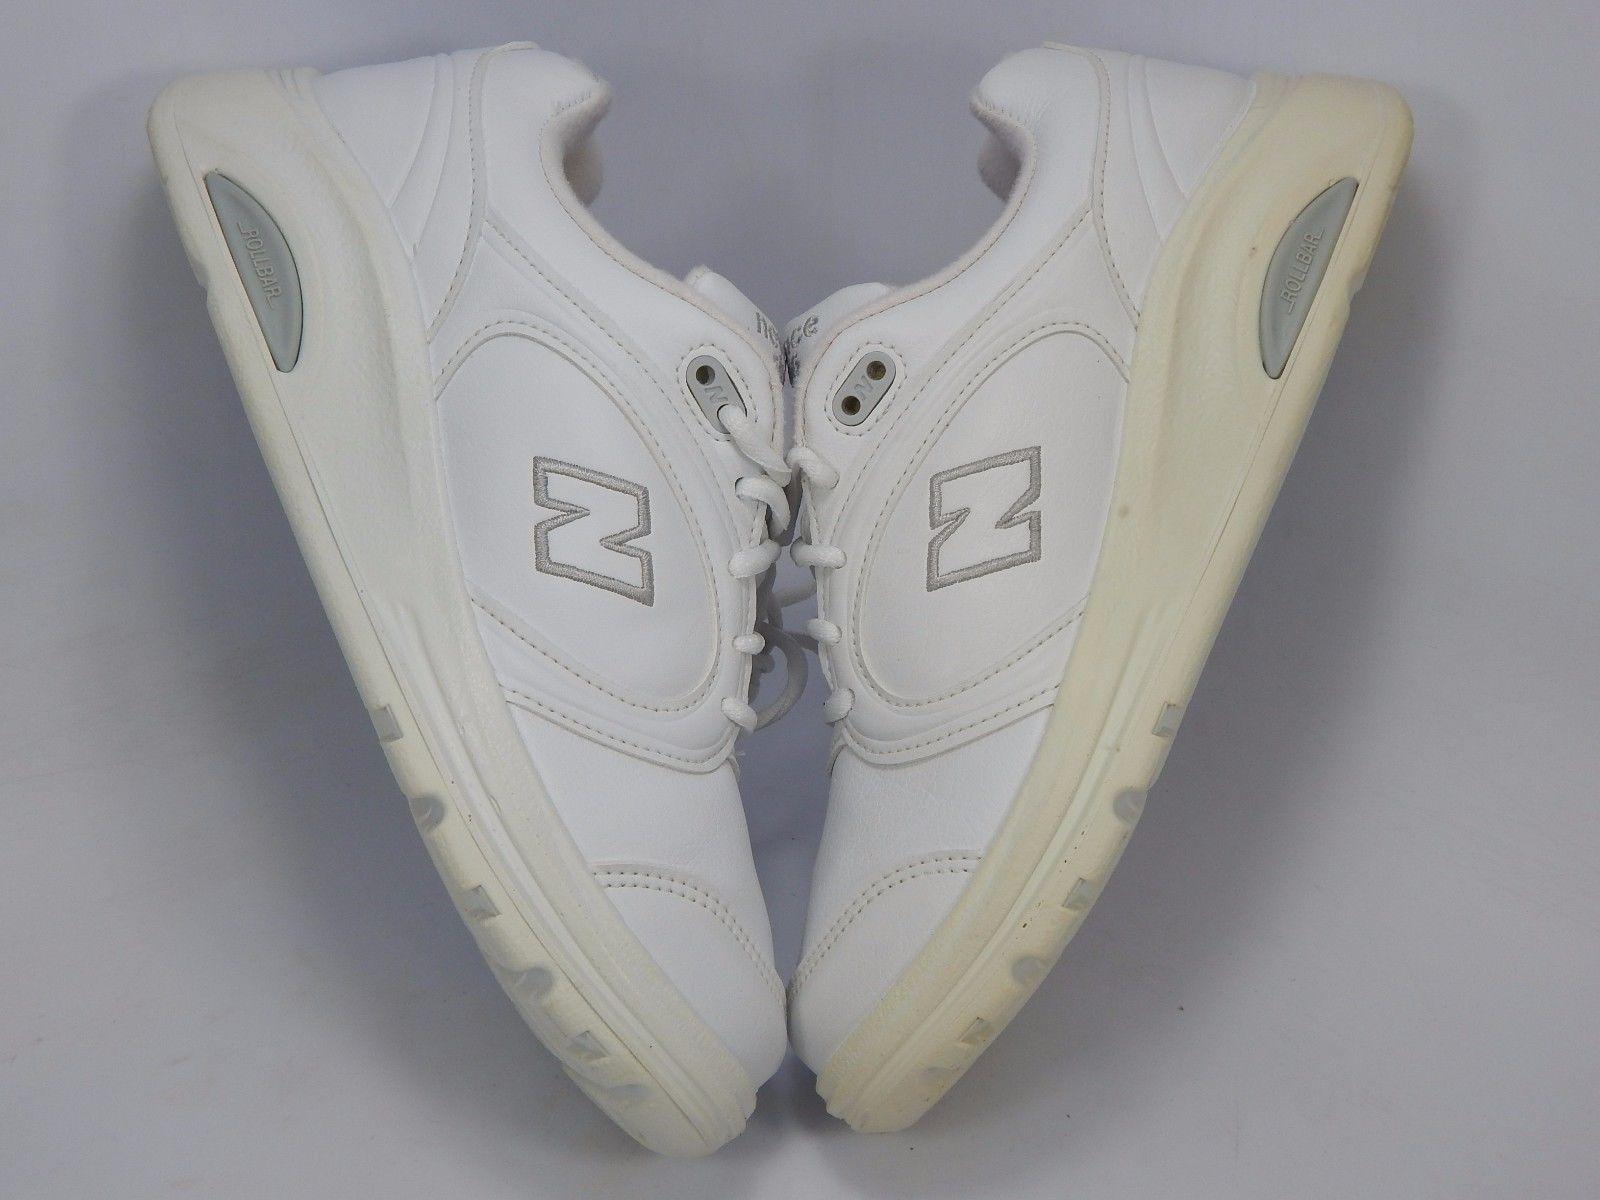 New Balance 812 Women's Walking Shoes Size US 6 M (B) EU 36.5 White WW812WT